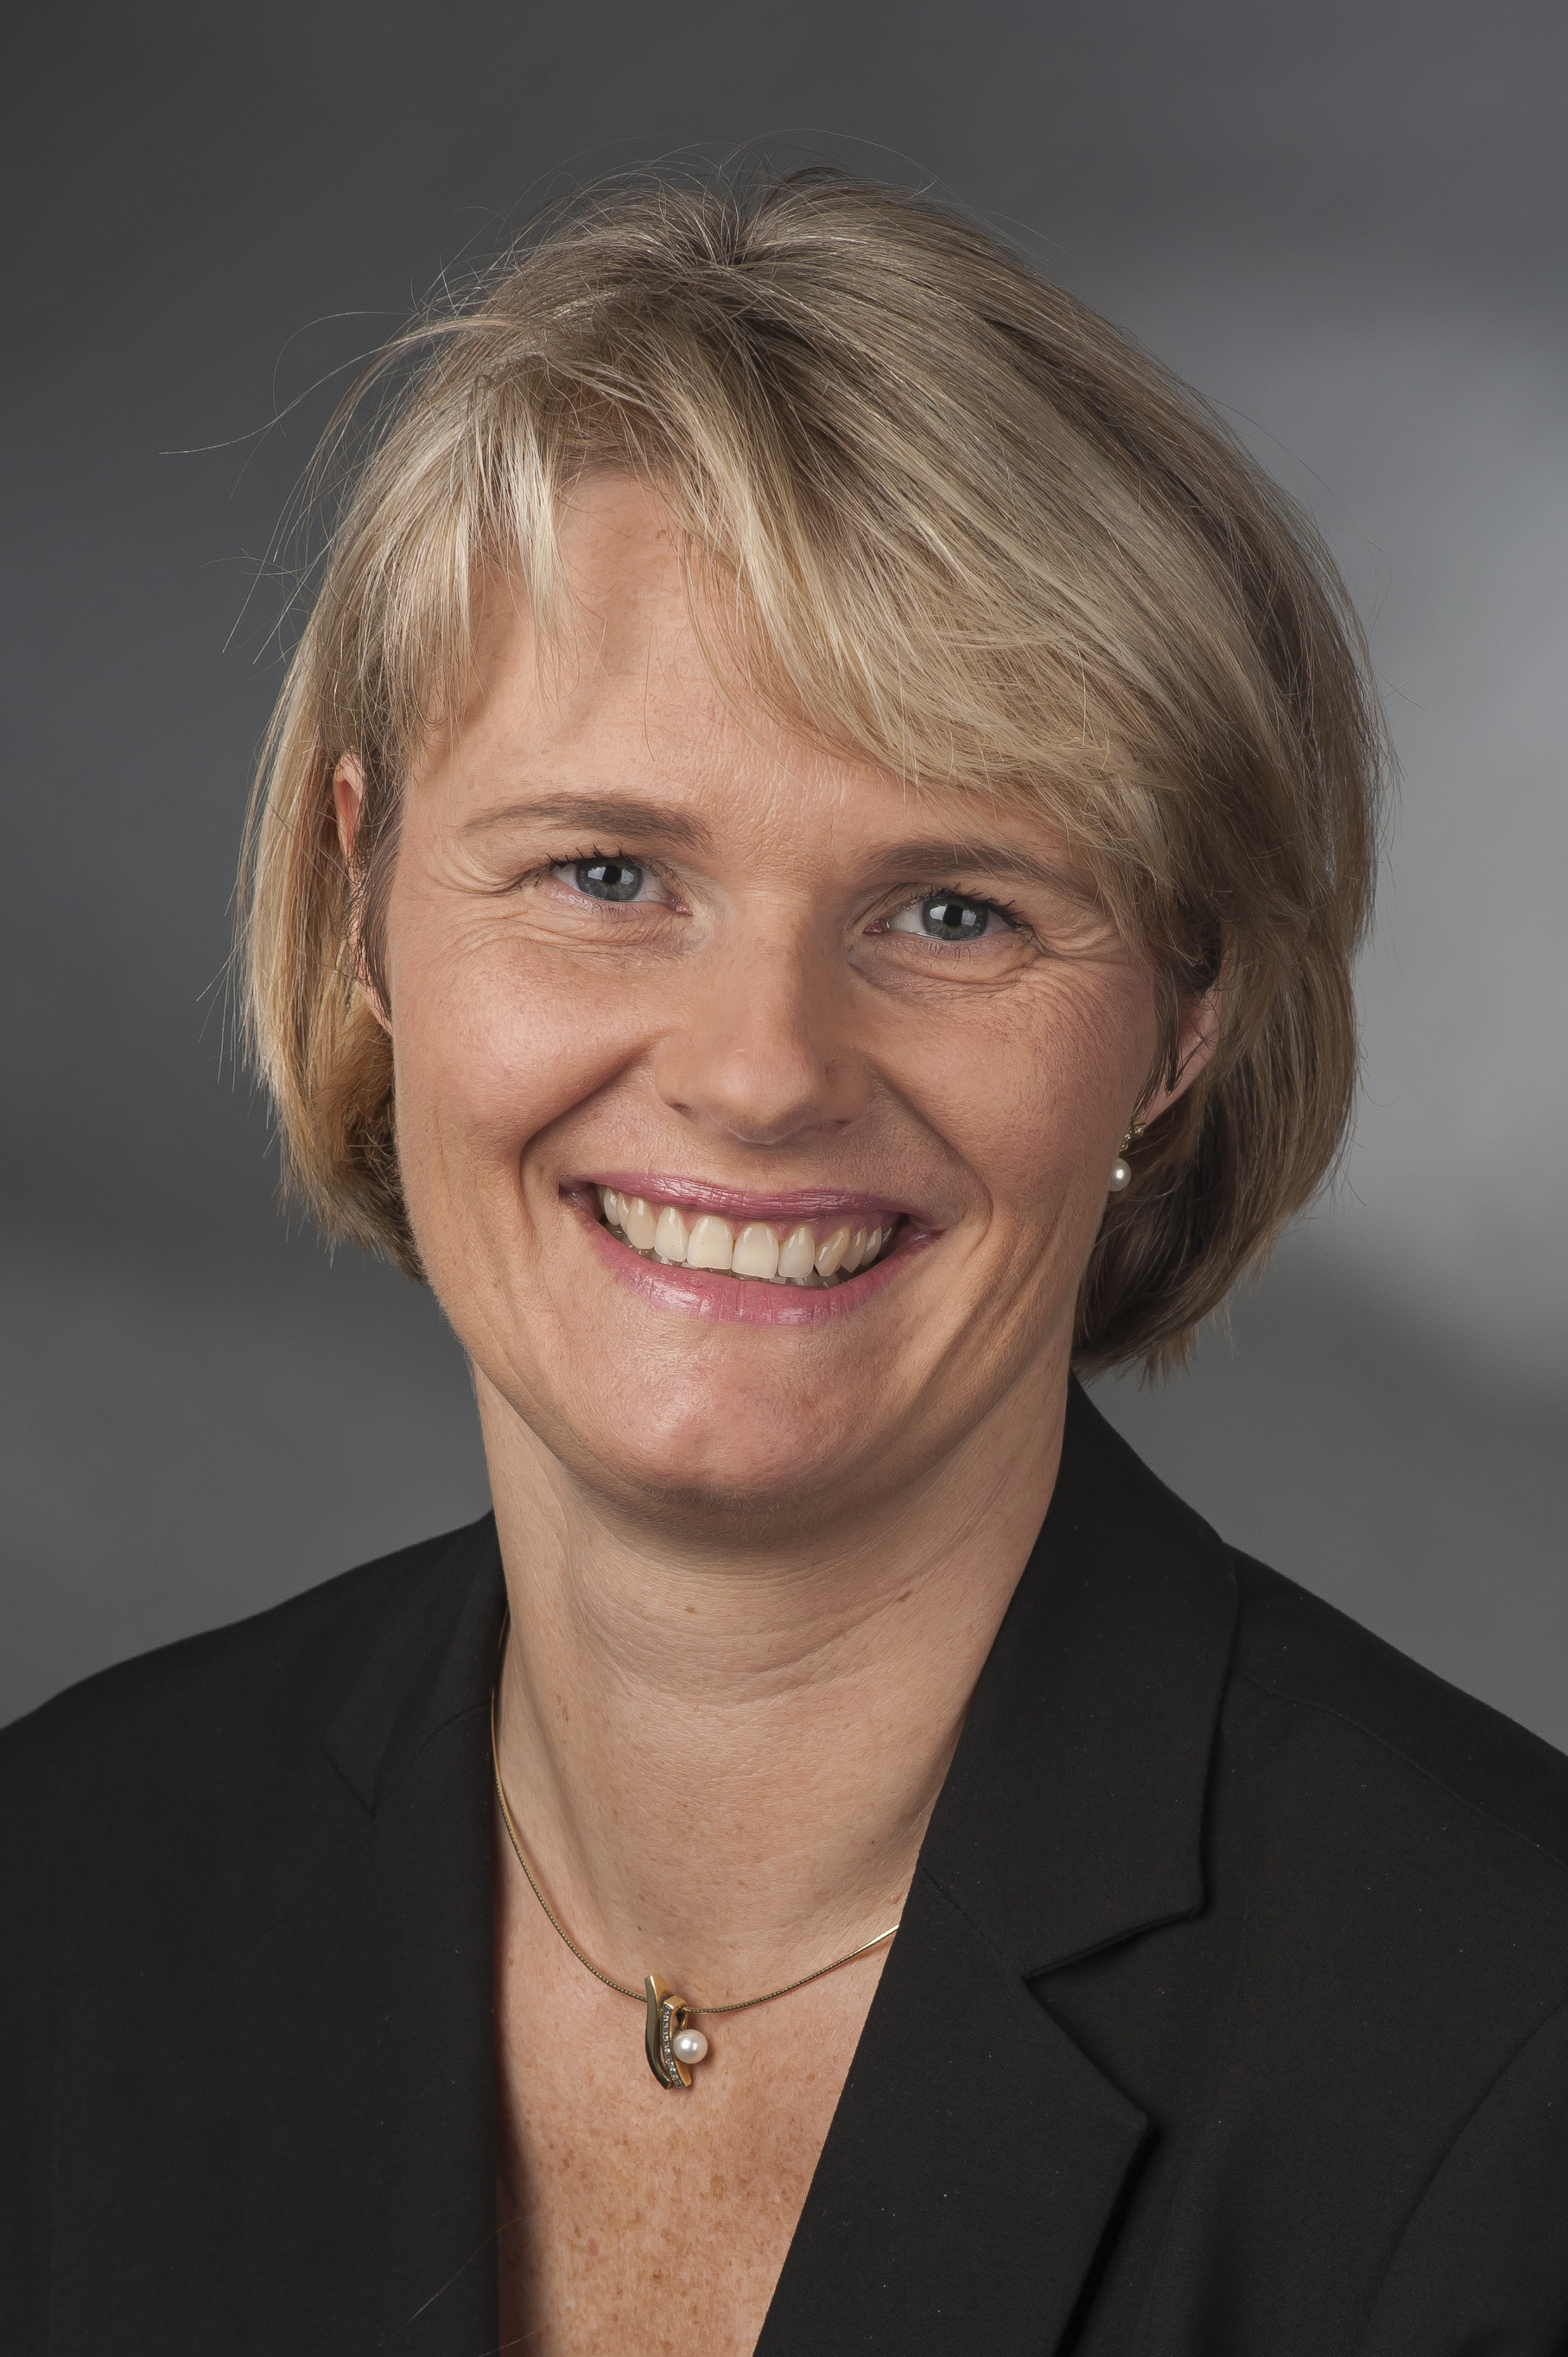 Anja Karliczek Wikipedia